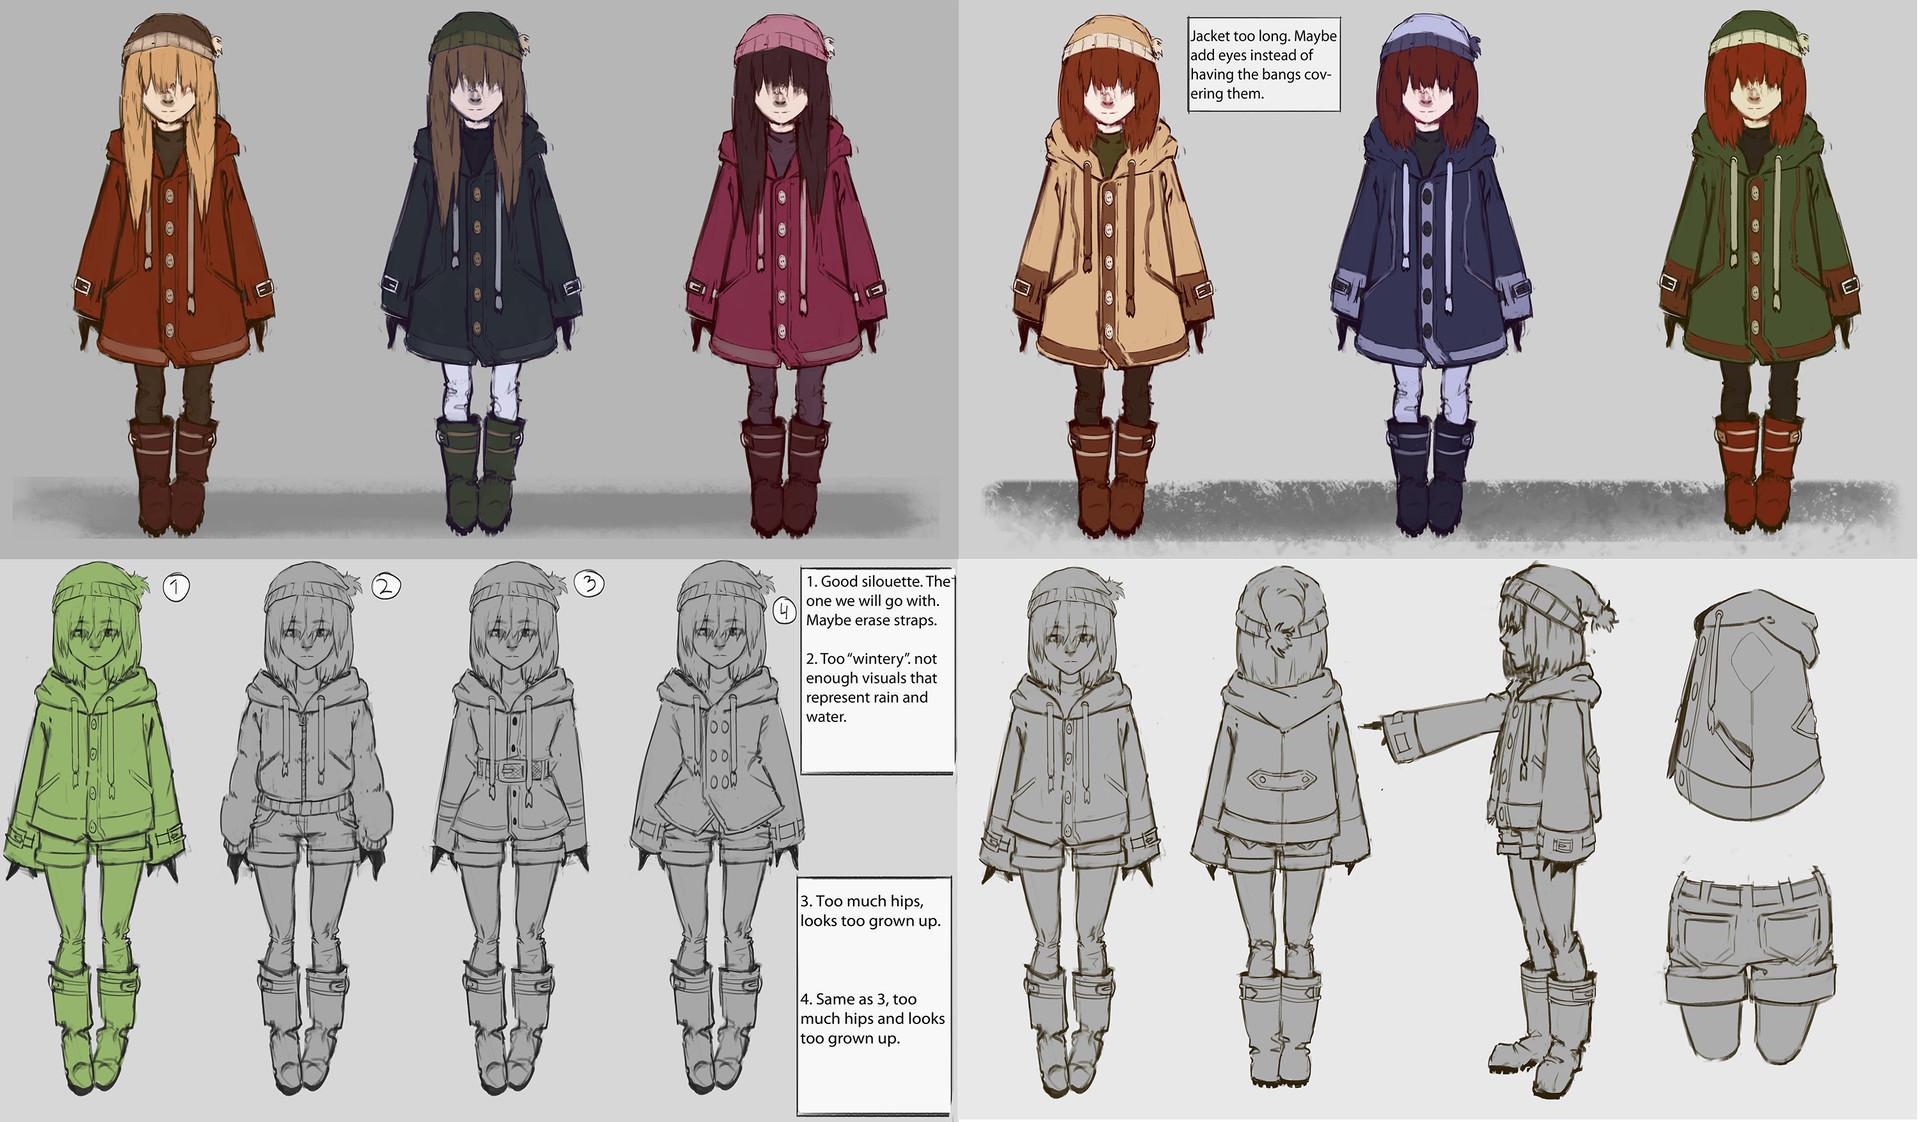 Emelie johansson echo character design 4 images